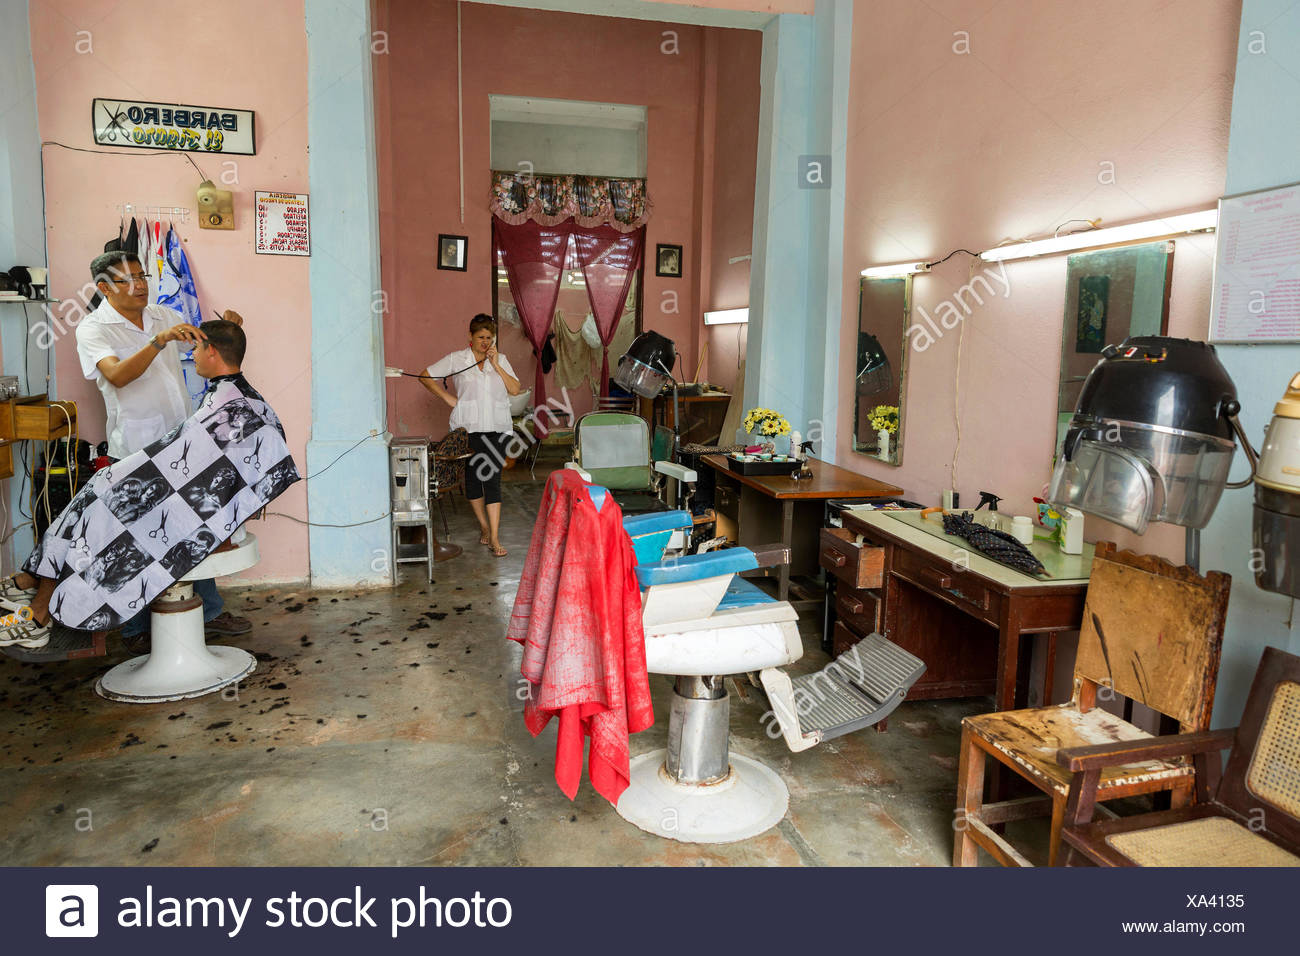 Friseurladen in Baracoa, Kuba Engl.: Kuba, Barbershop in Baracoa Stockbild